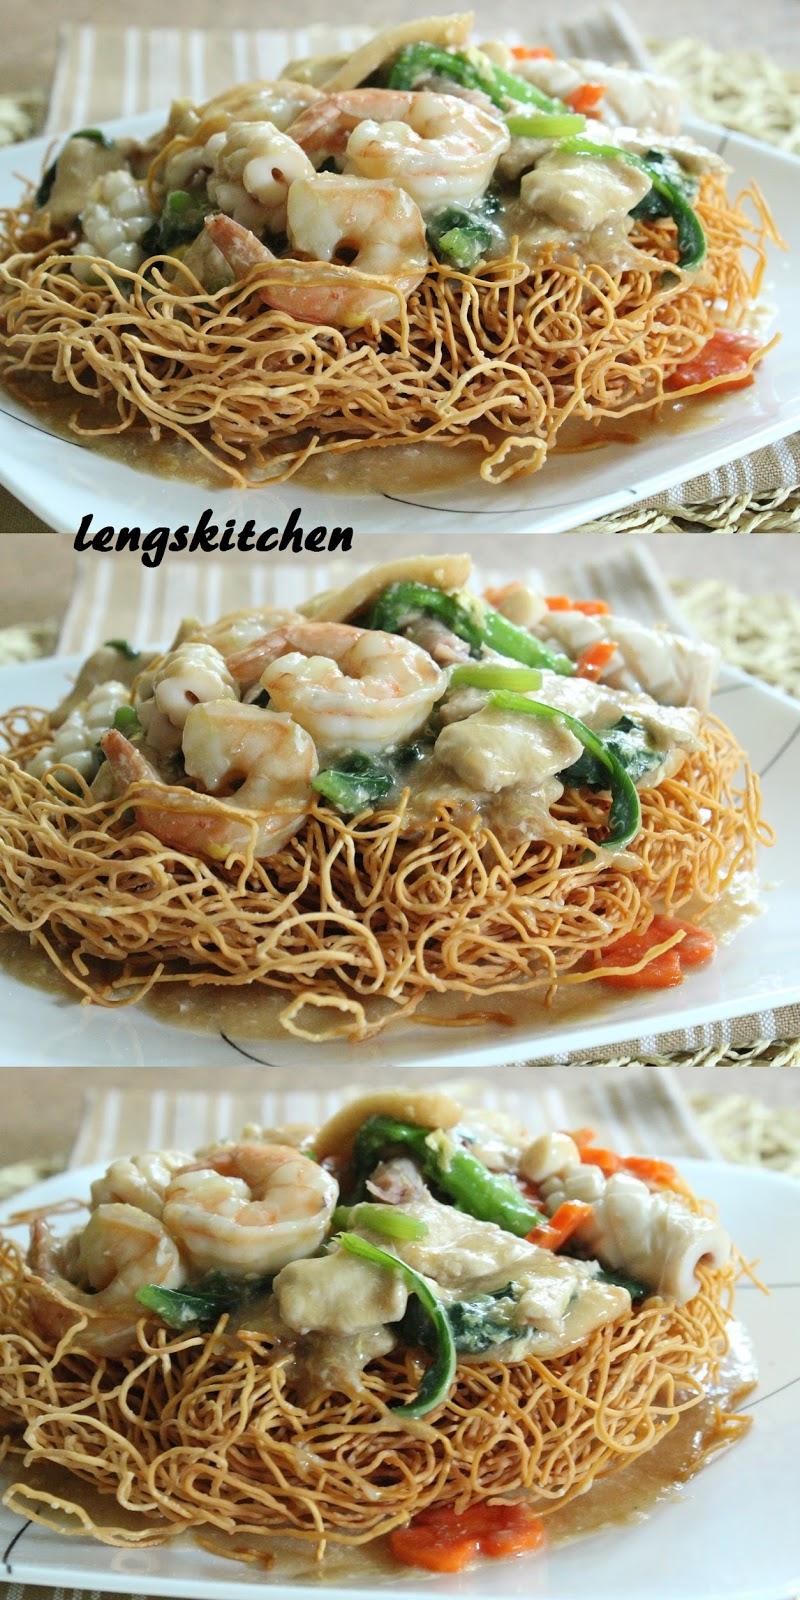 thursday august 8 2013 - China Kitchen Green Bay 2